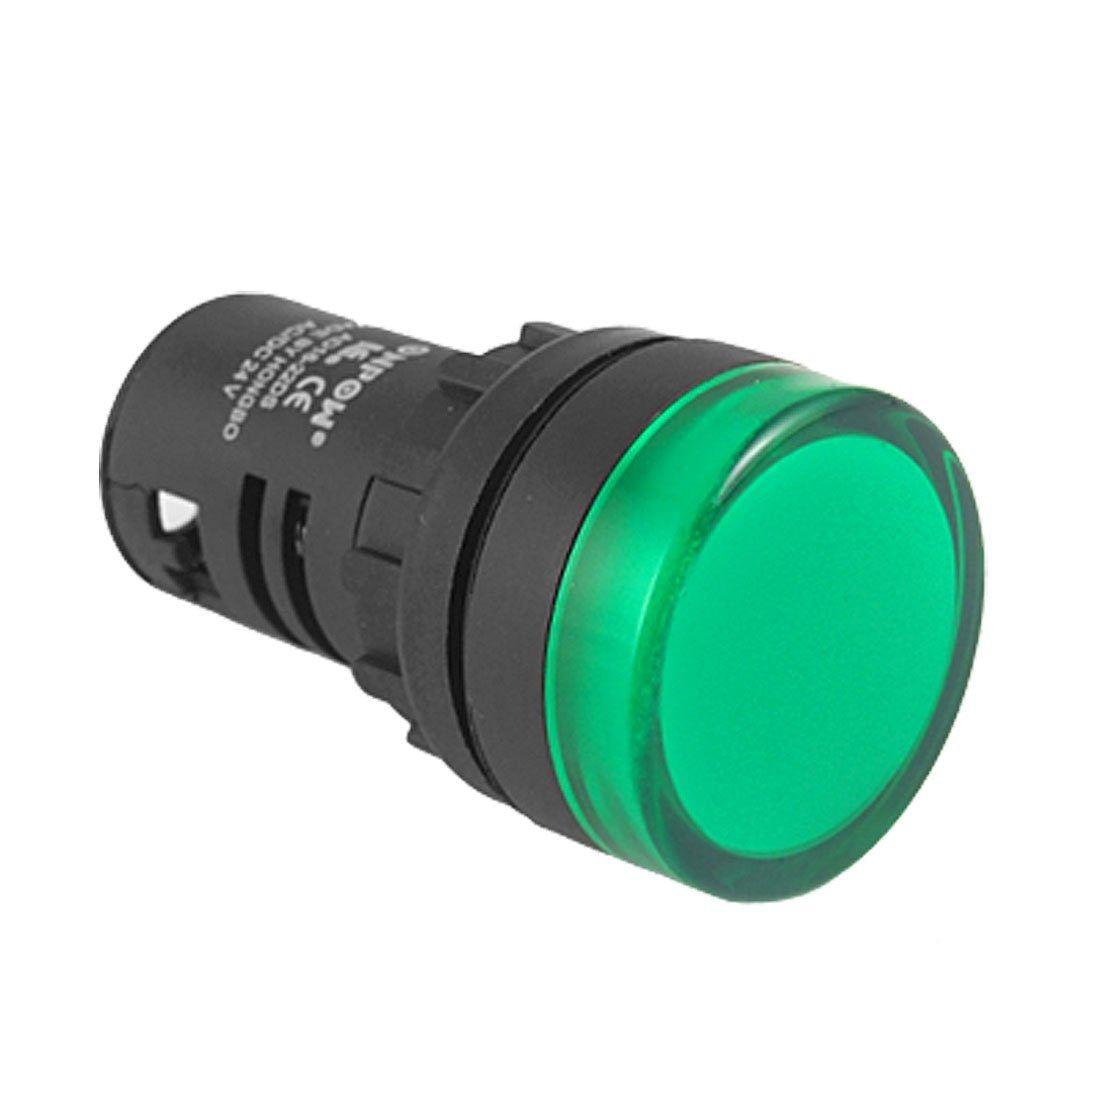 116 Reference Of Pilot Indicator Light 24v In 2020 Indicator Lights Lamp Light